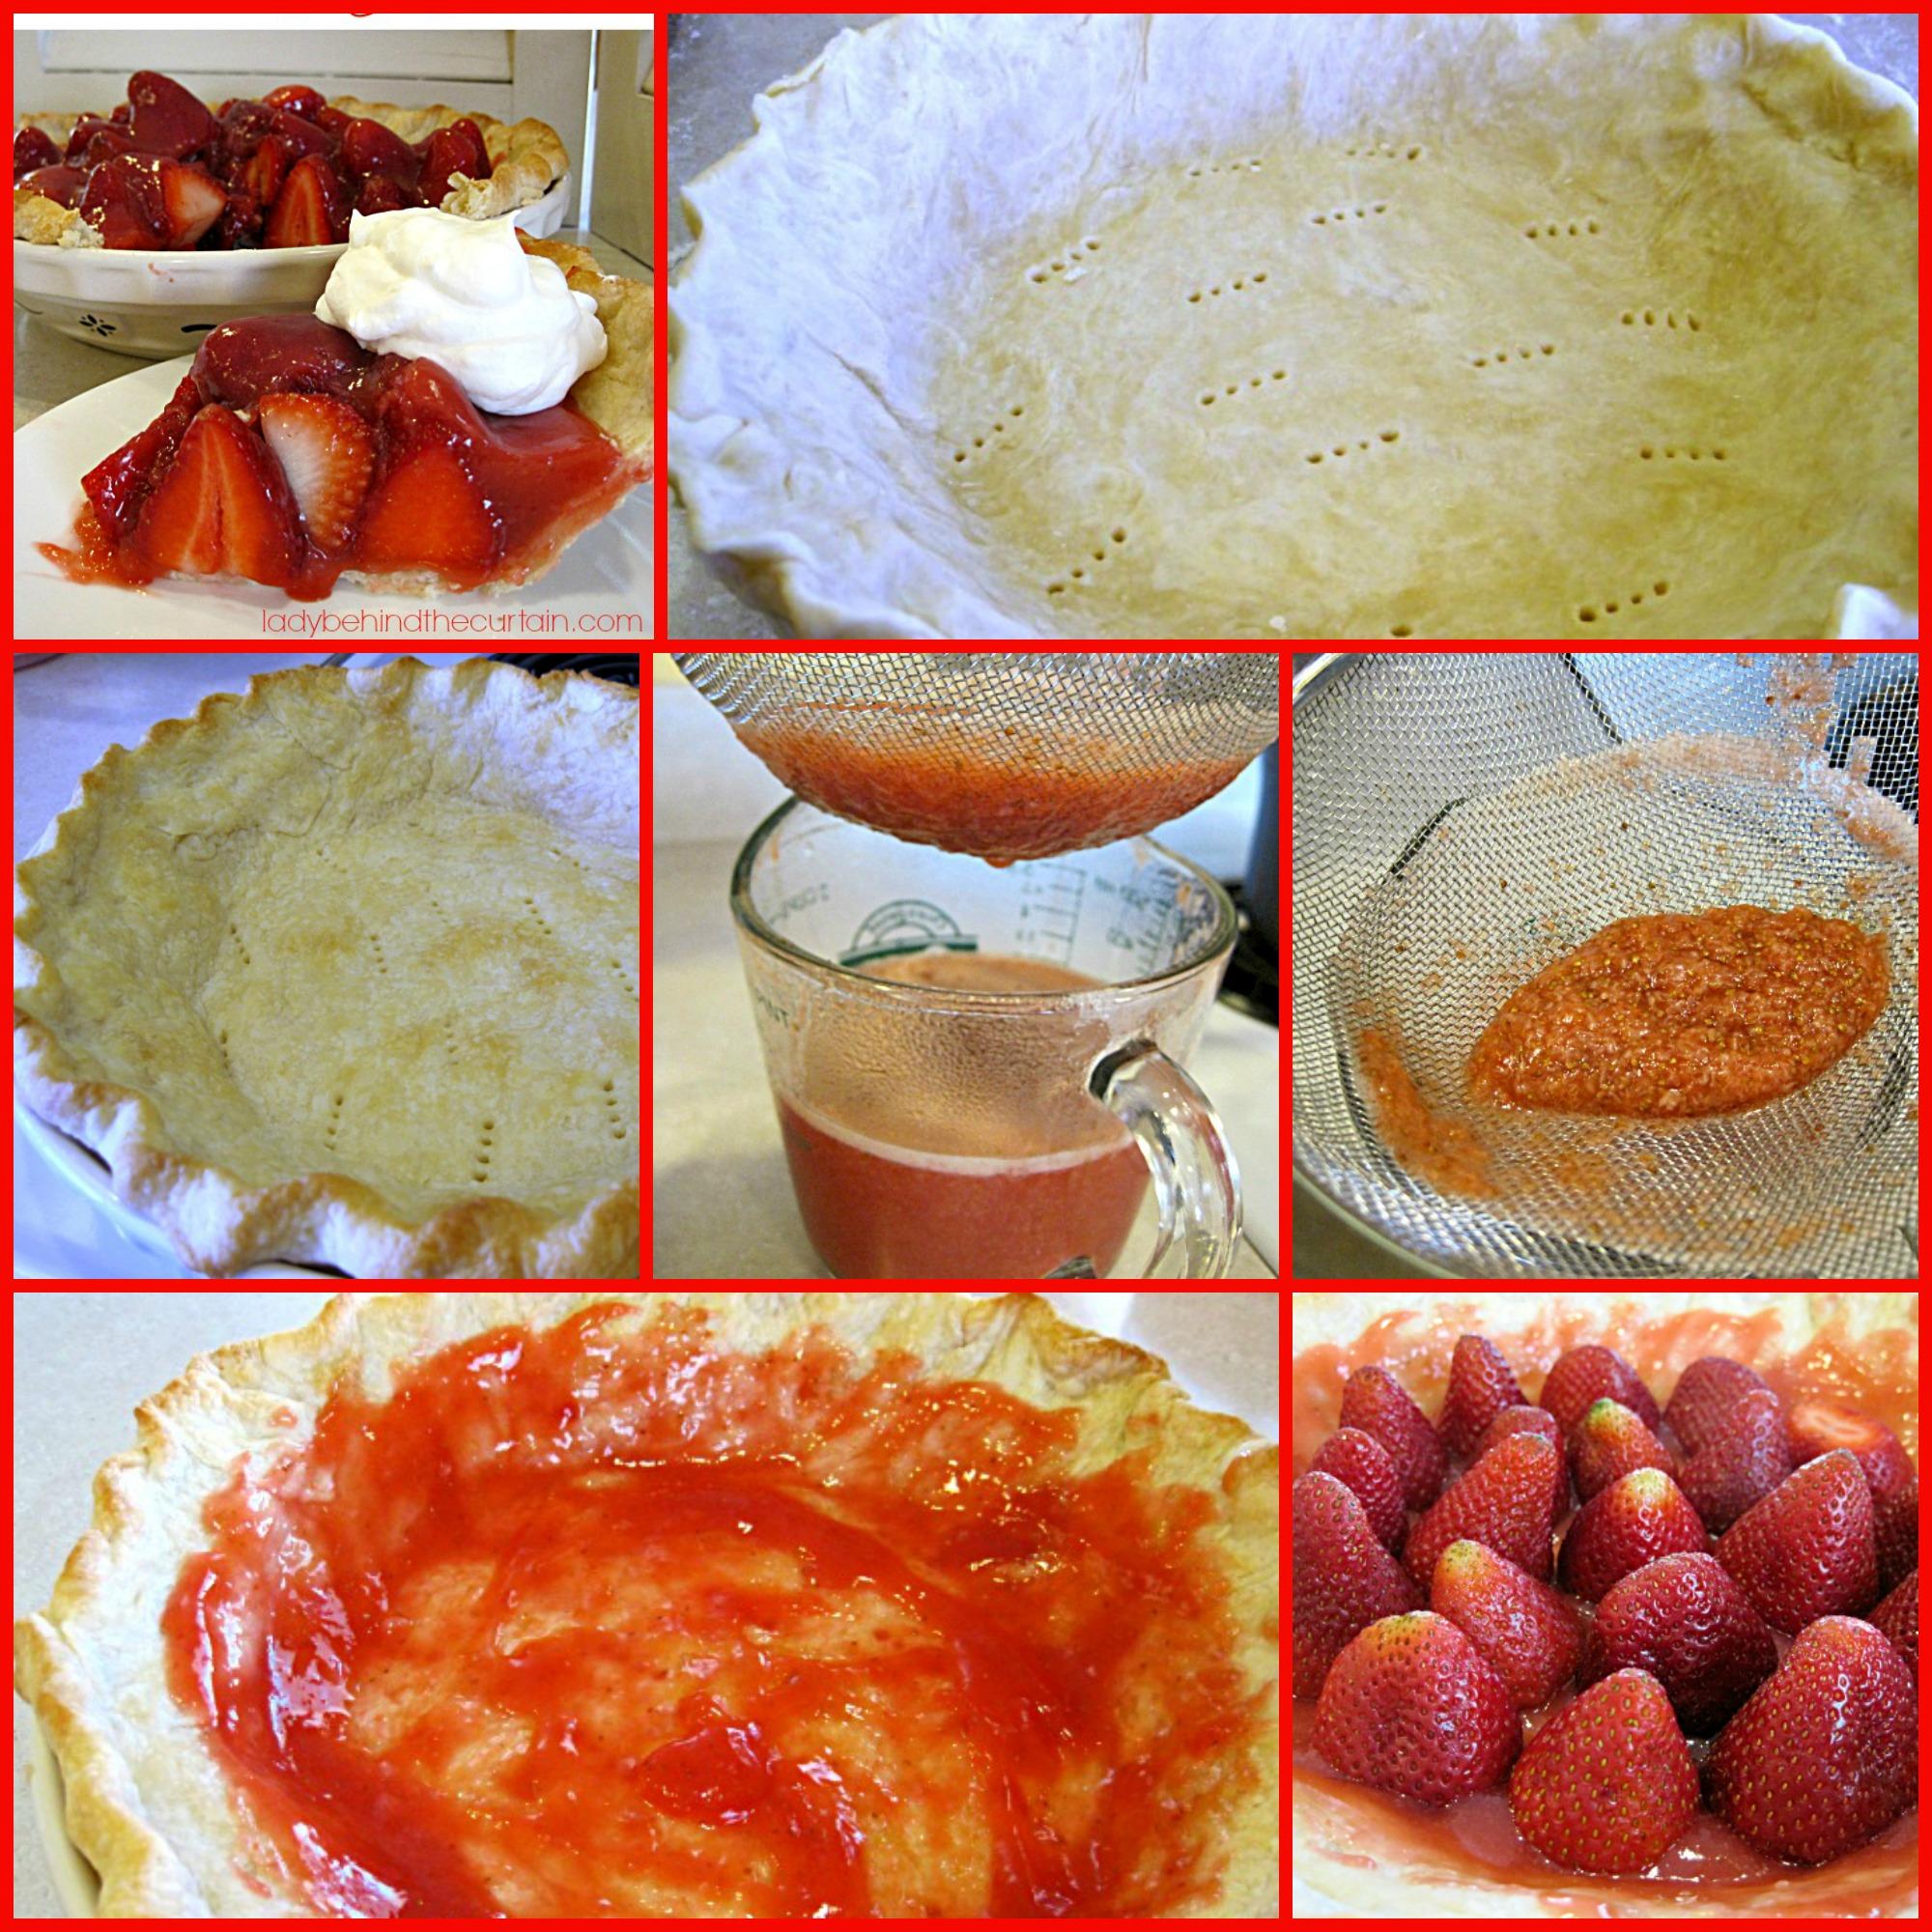 Fresh Strawberry Pie With Orange Liqueur Glaze Recipes — Dishmaps